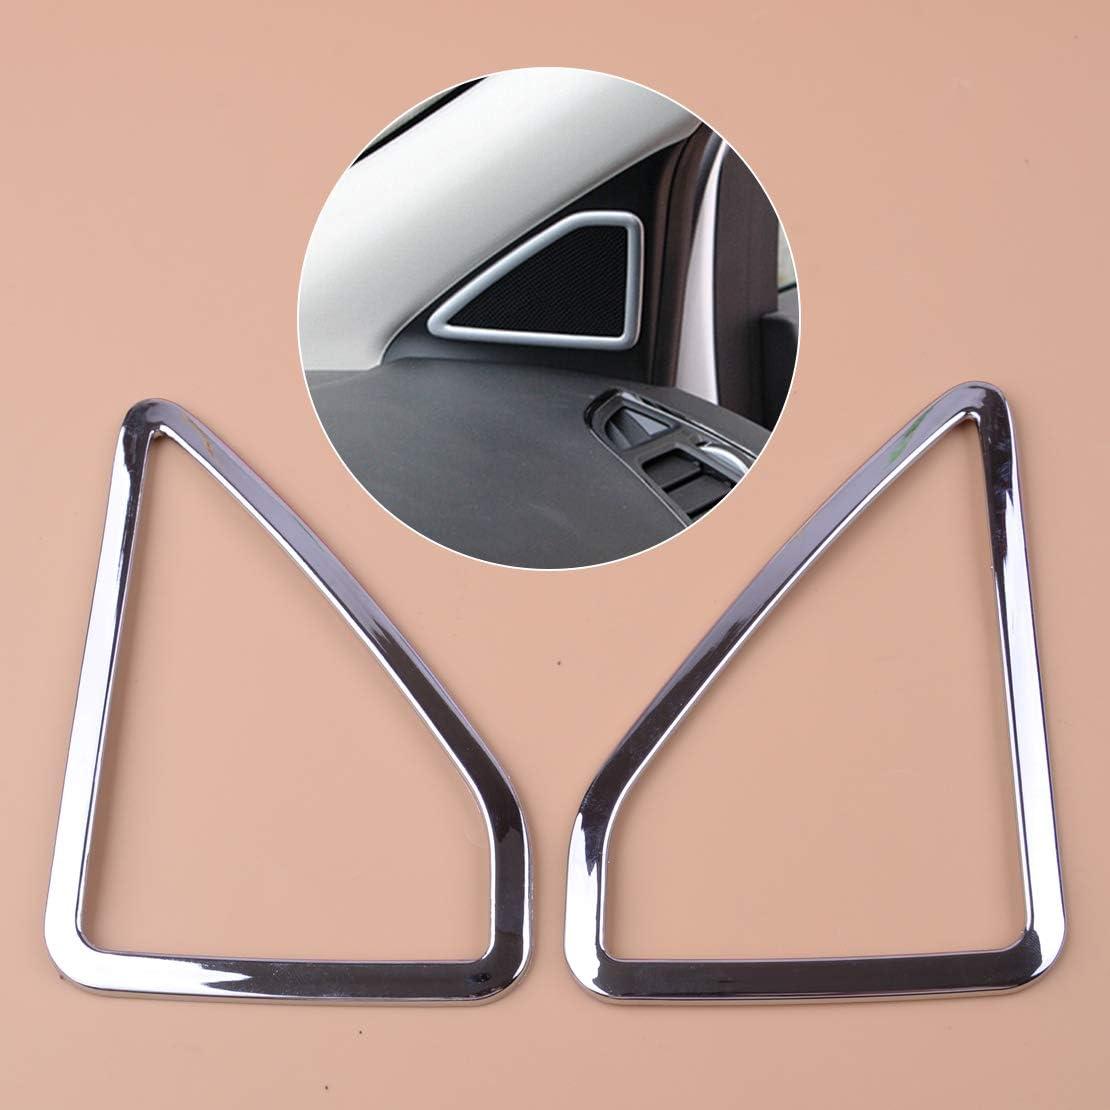 Eastar innere A-S/äulent/ür Stereo Audia Pillar Lautsprecherabdeckung Verkleidung L/ünette f/ür Ford Kuga 2013-2018